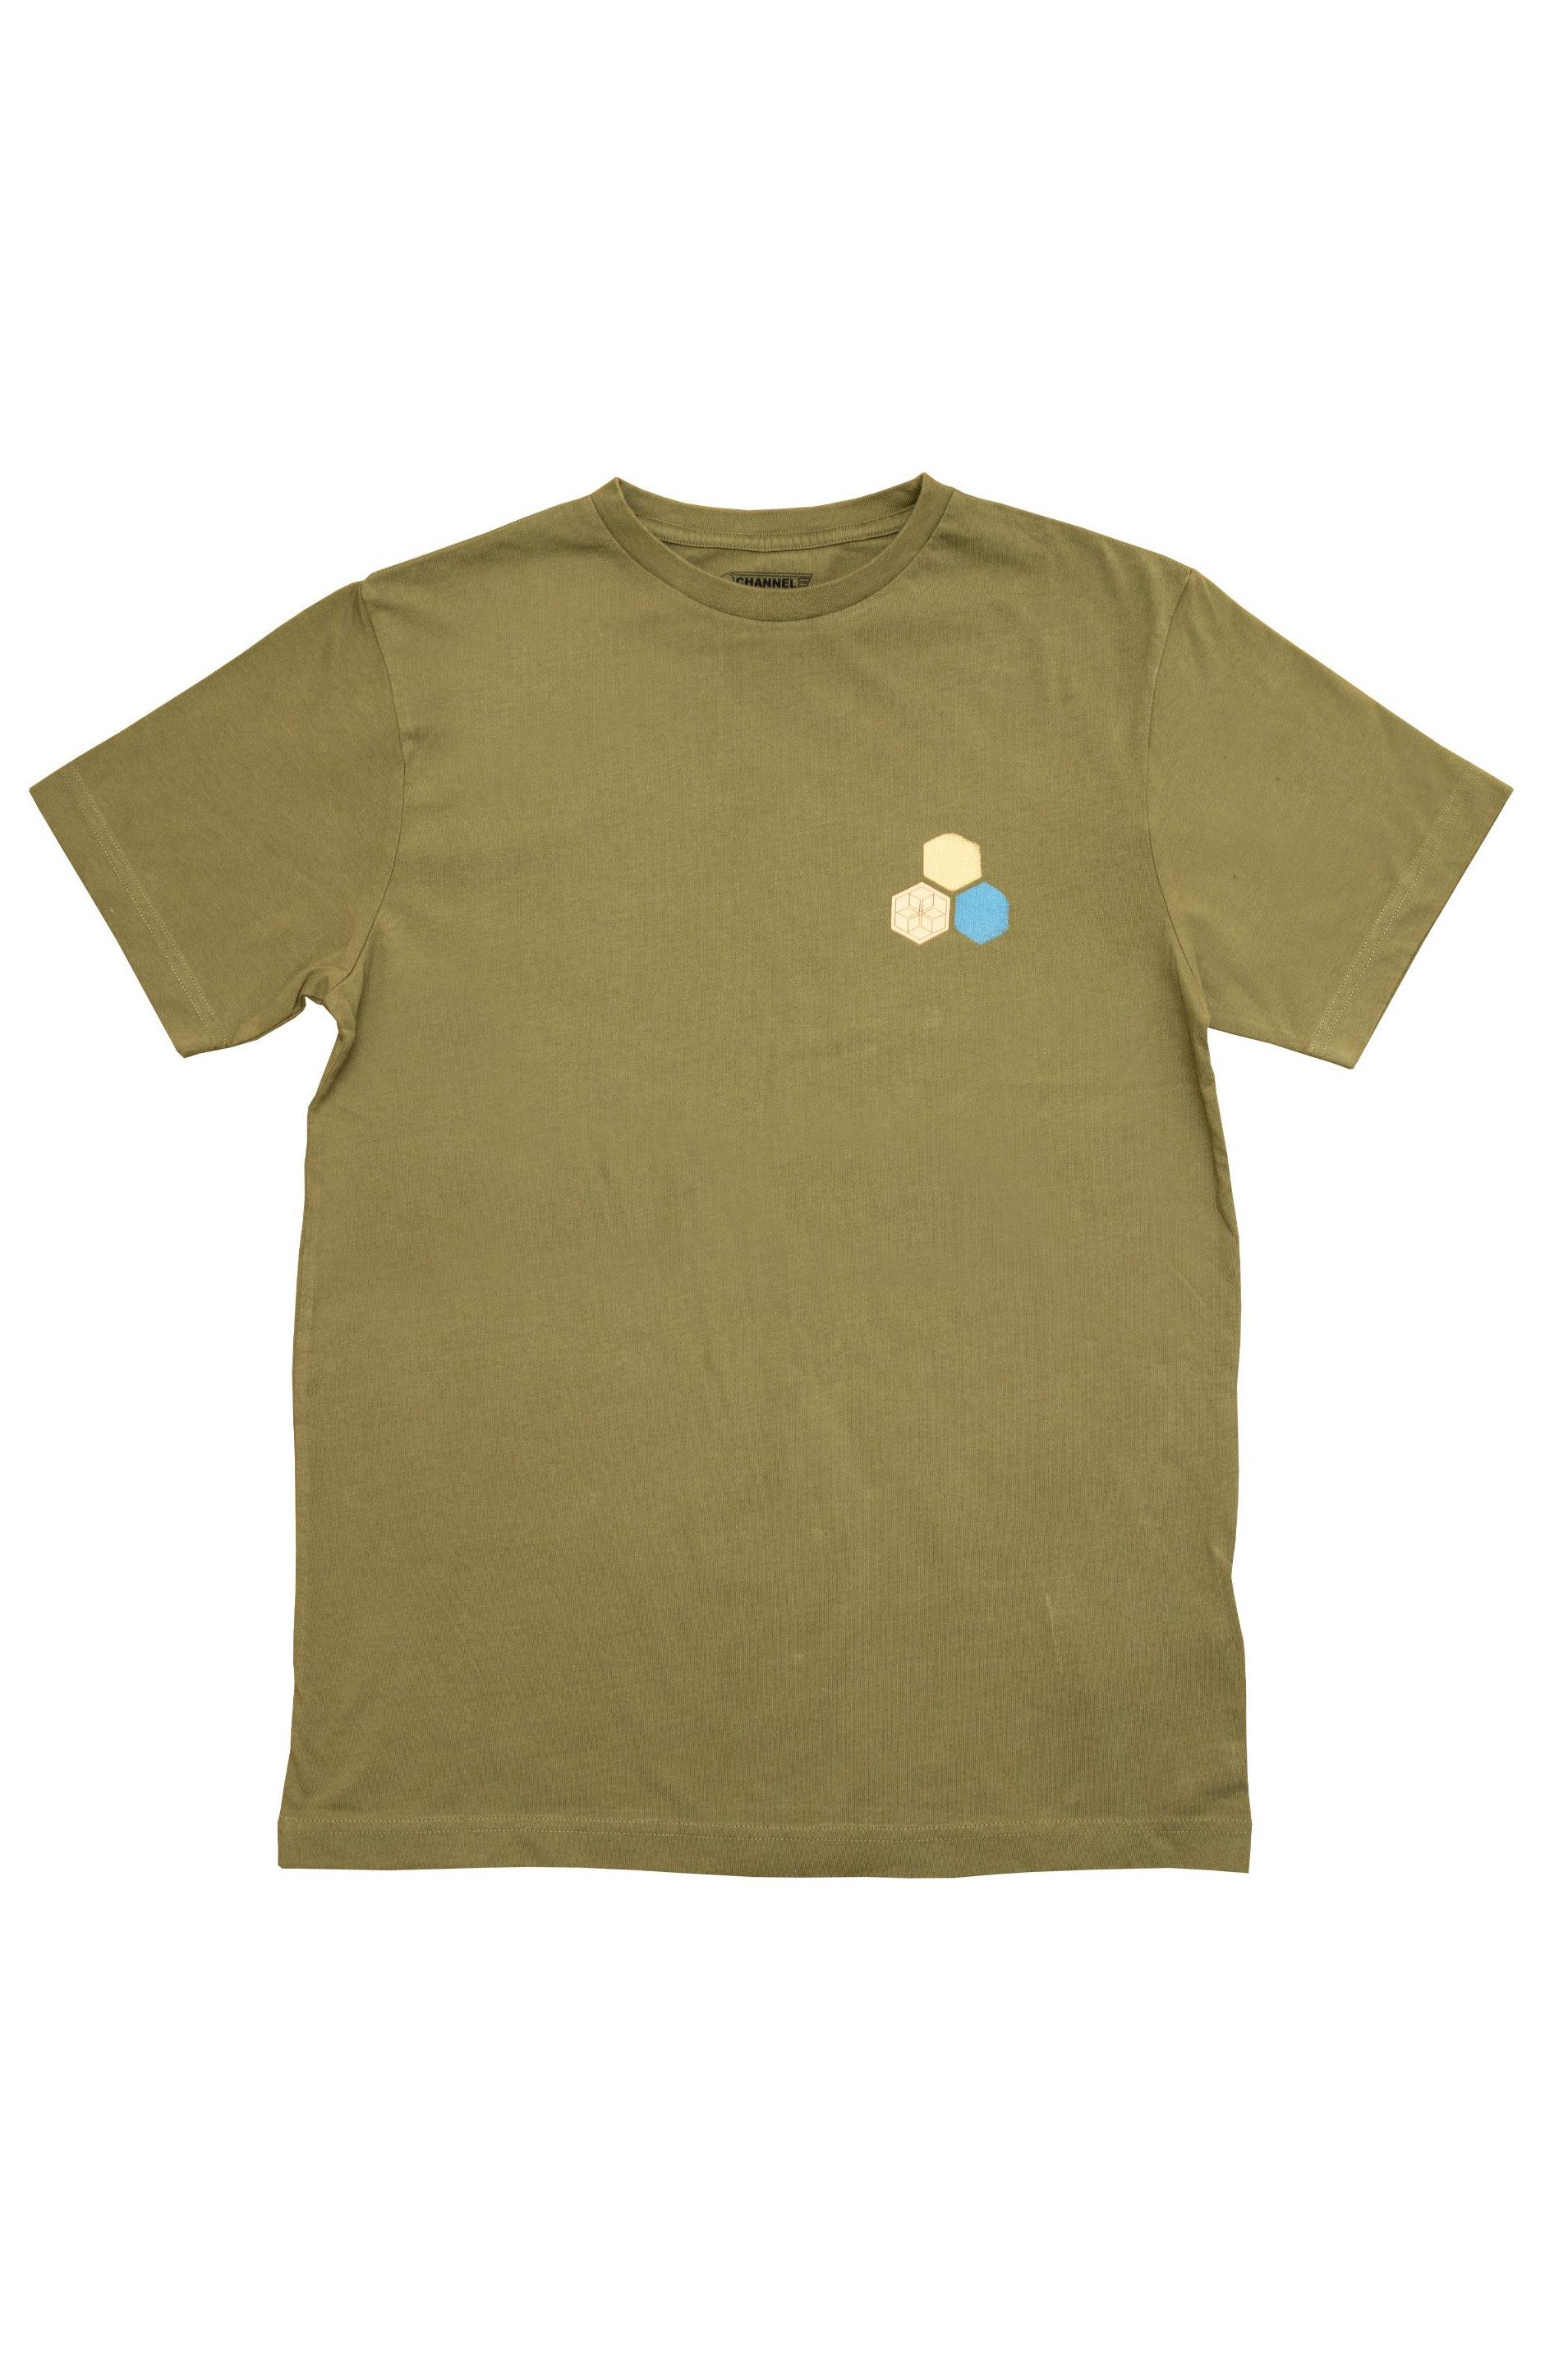 T-Shirt Al Merrick PASTEL SS Martini Olive